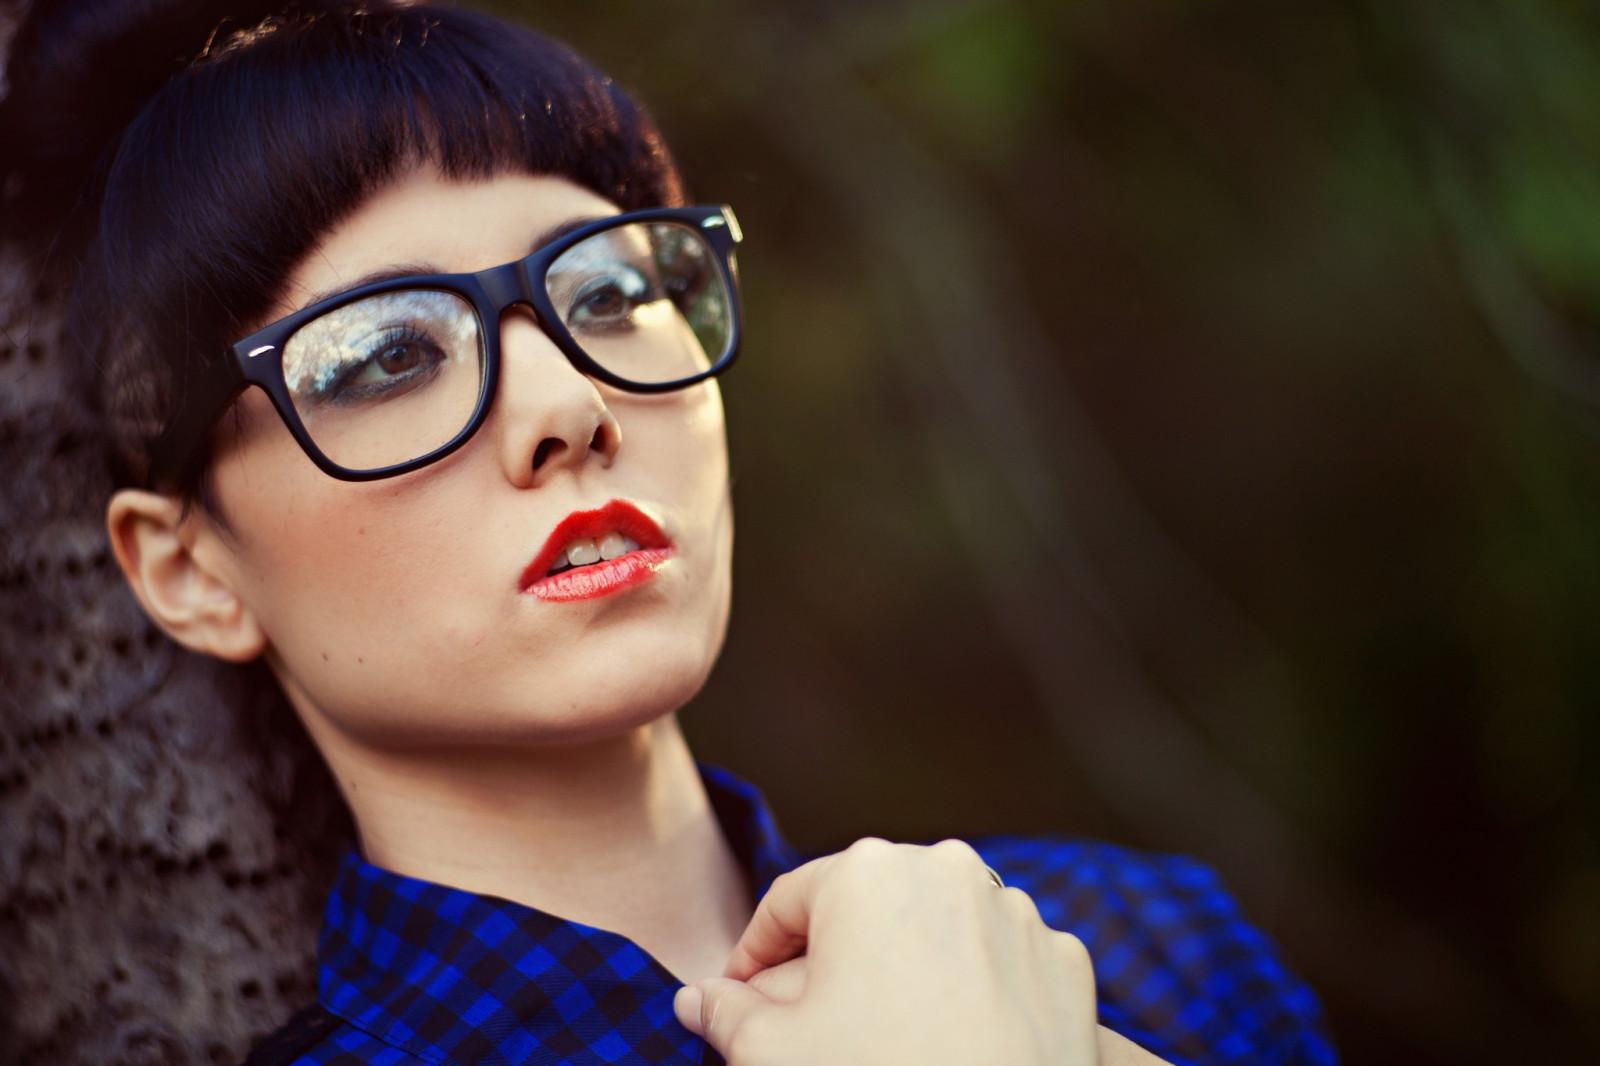 Red Lipstick Brown Hair Blue Eyes: Wallpaper : Face, Women Outdoors, Model, Looking Away